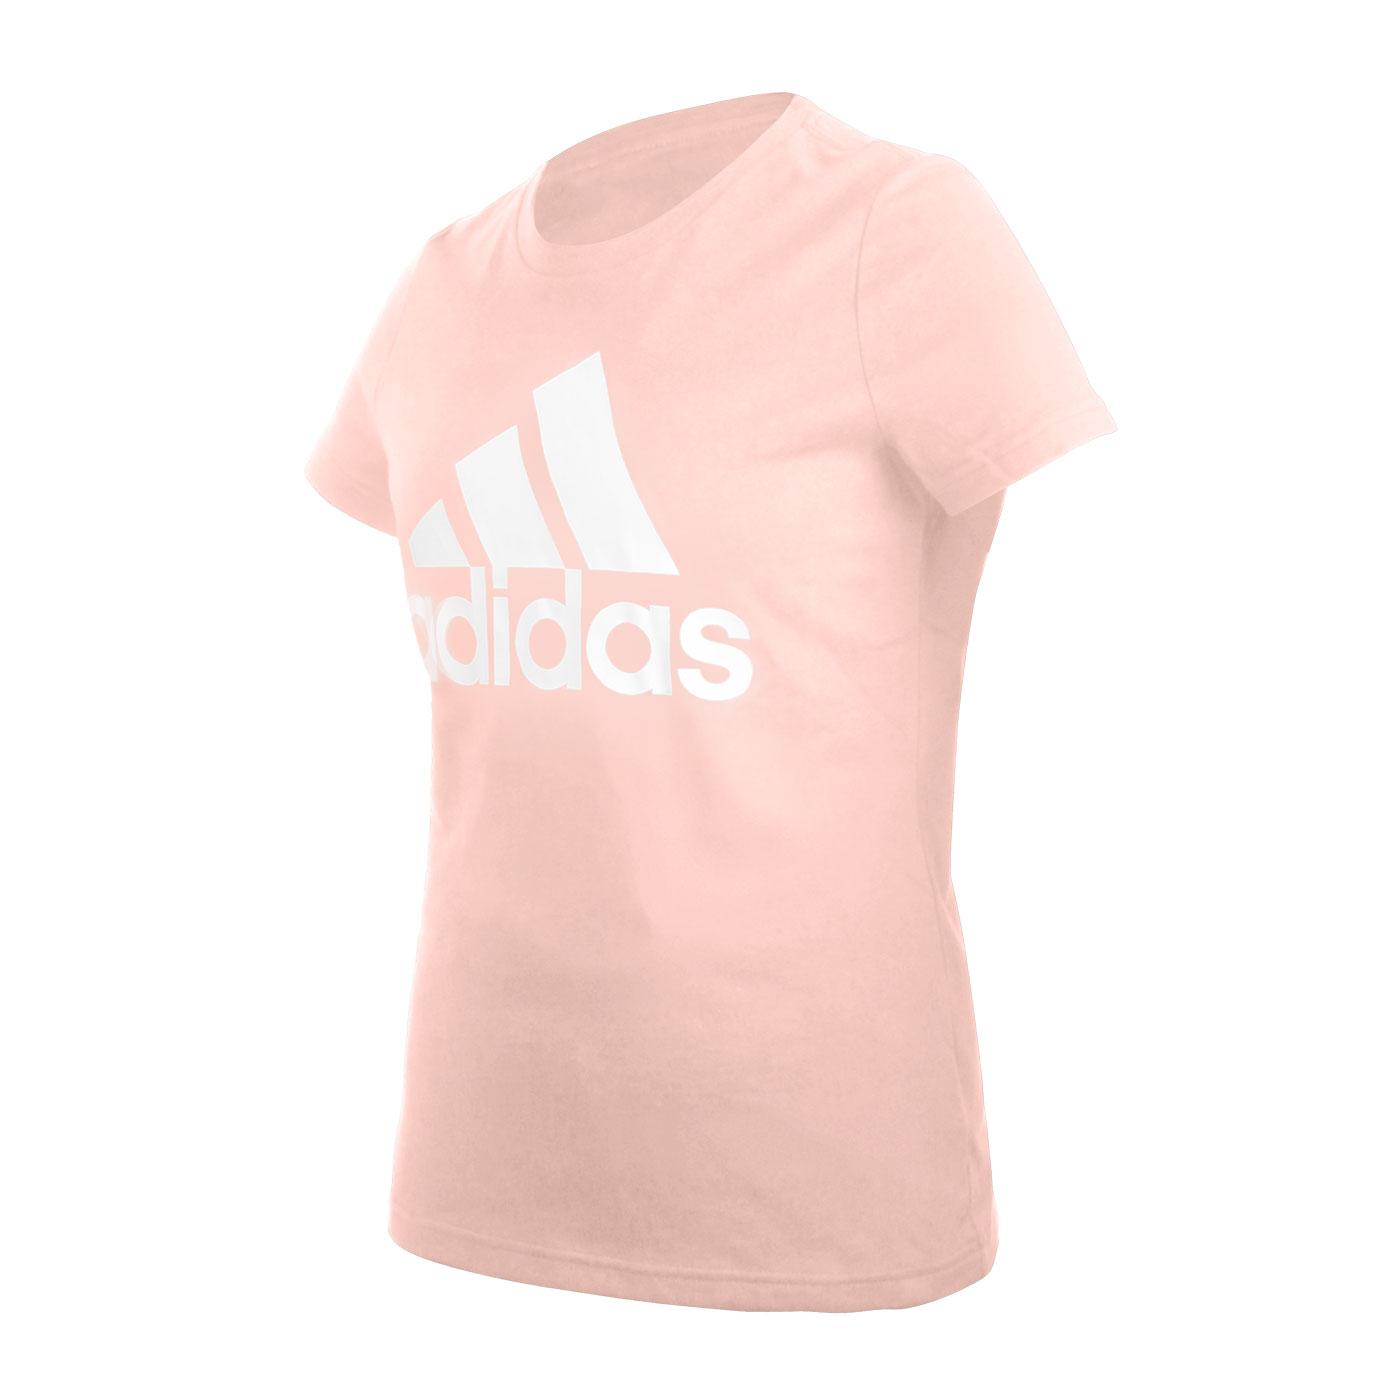 ADIDAS 女款短袖T恤 FQ3237 - 粉白